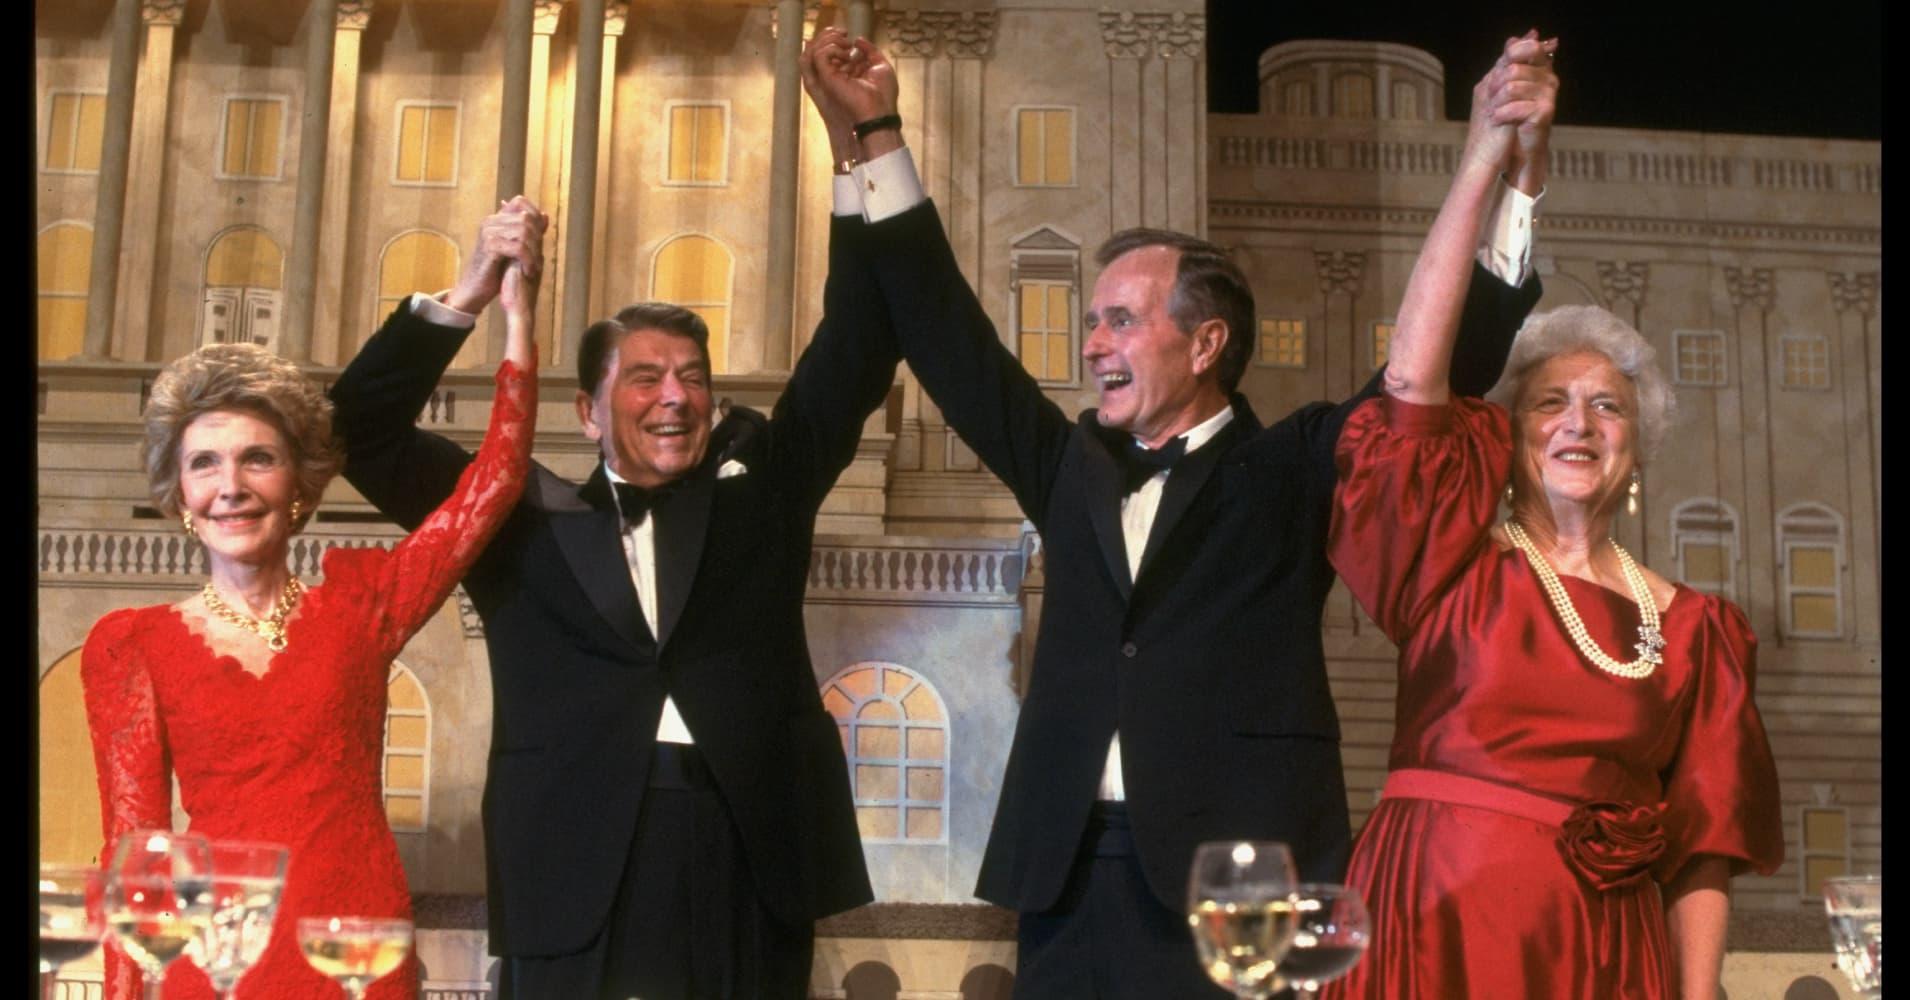 VP & Barbara Bush (L) w. Pres. & Nancy Reagan as Reagan endorses Bush's pres. candidacy at president's dinner.